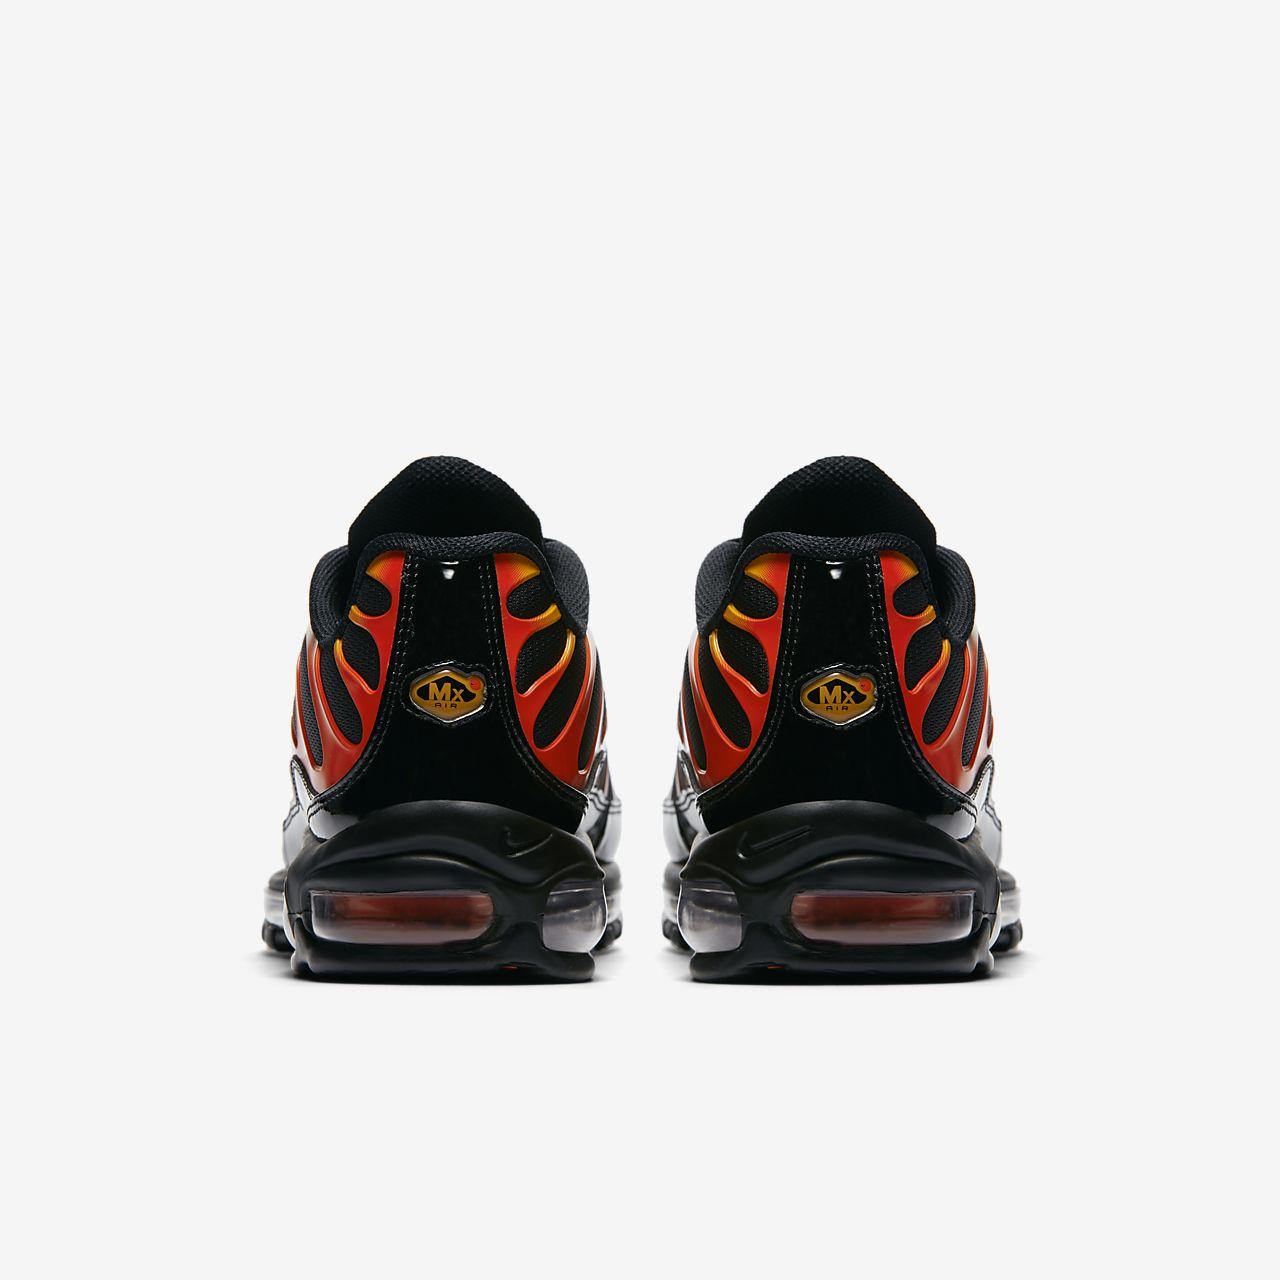 scarpa nike air max 97 plus neroengine 1shock orangenero